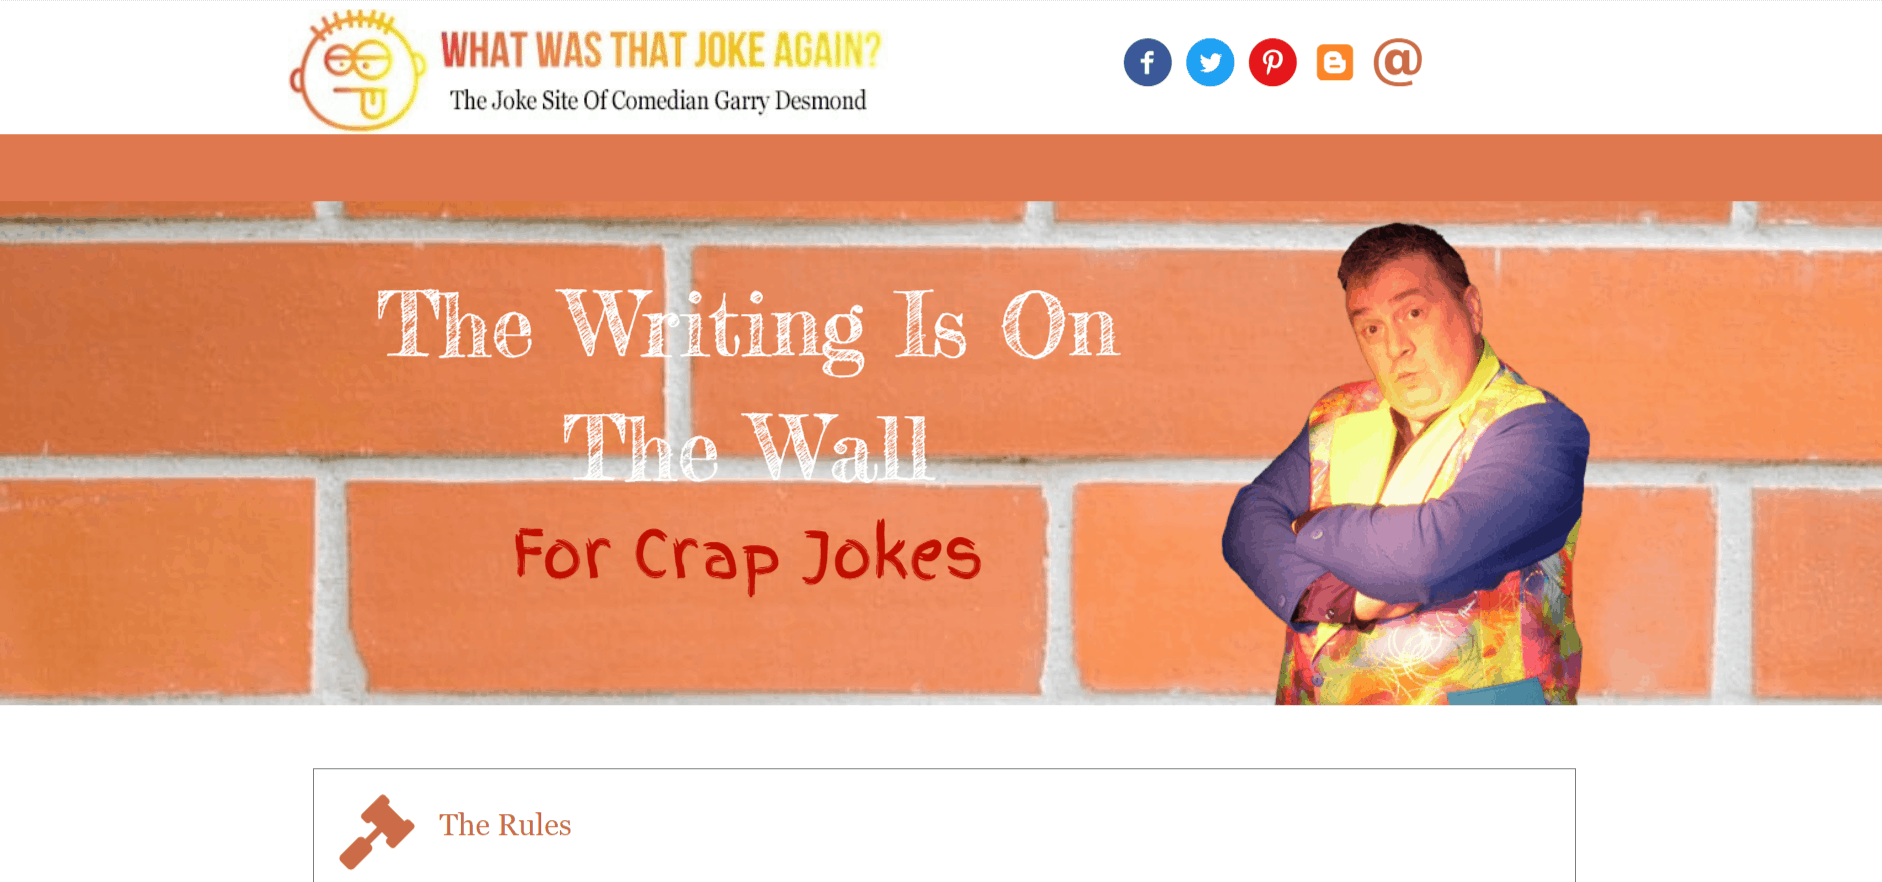 What was that joke again